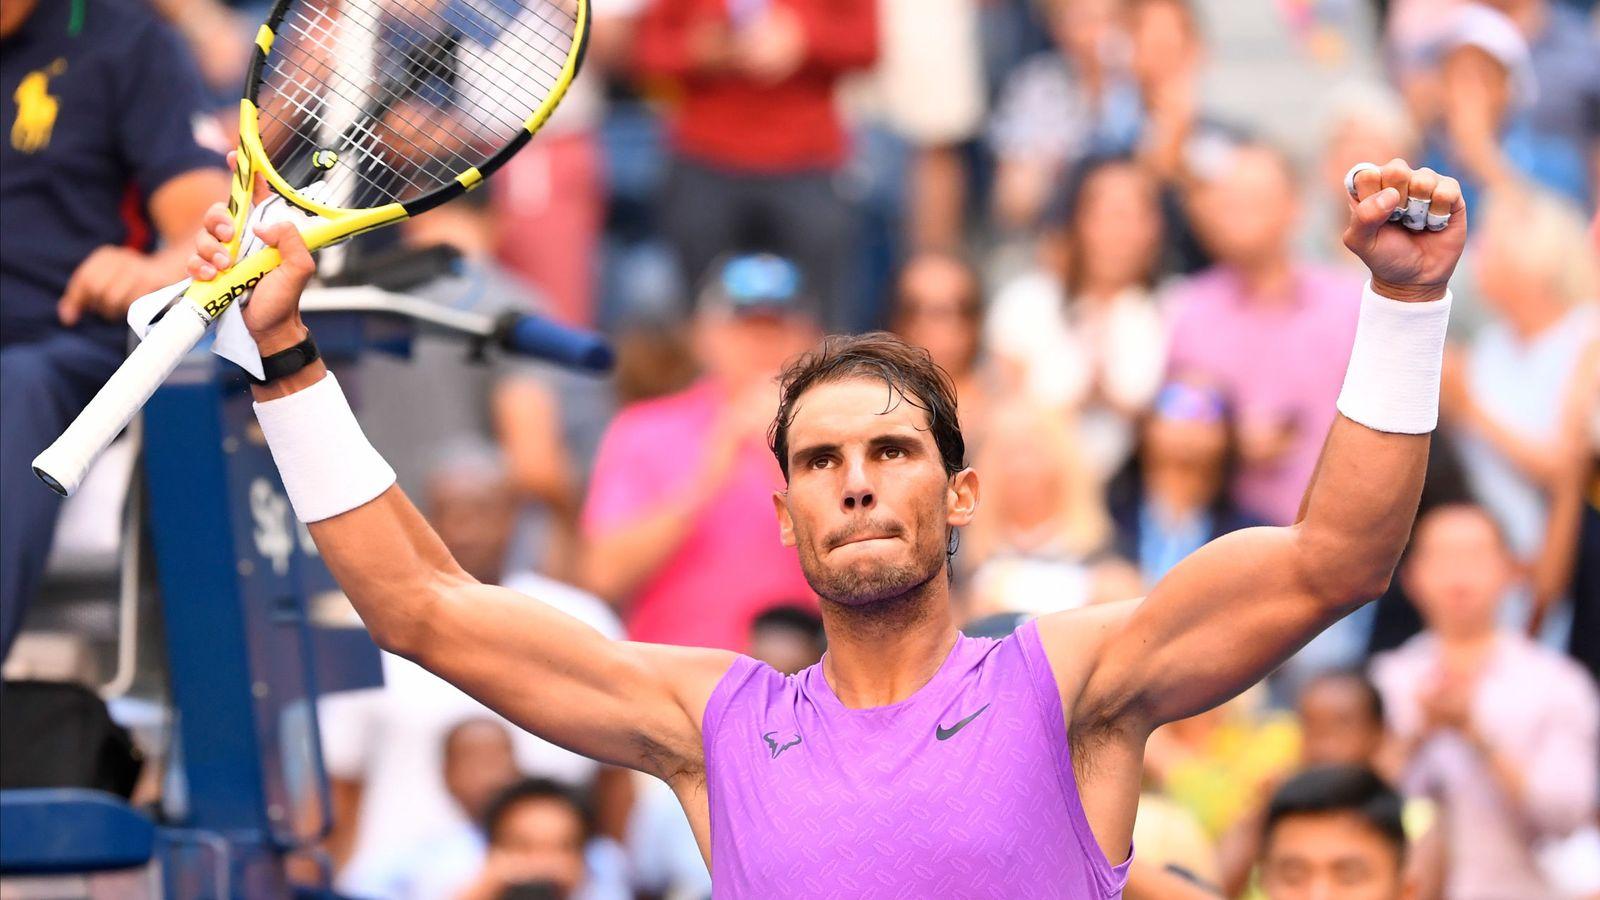 Foto: Rafa Nadal celebra su pase a octavos del US Open tras derrotar a Chung. (Reuters)